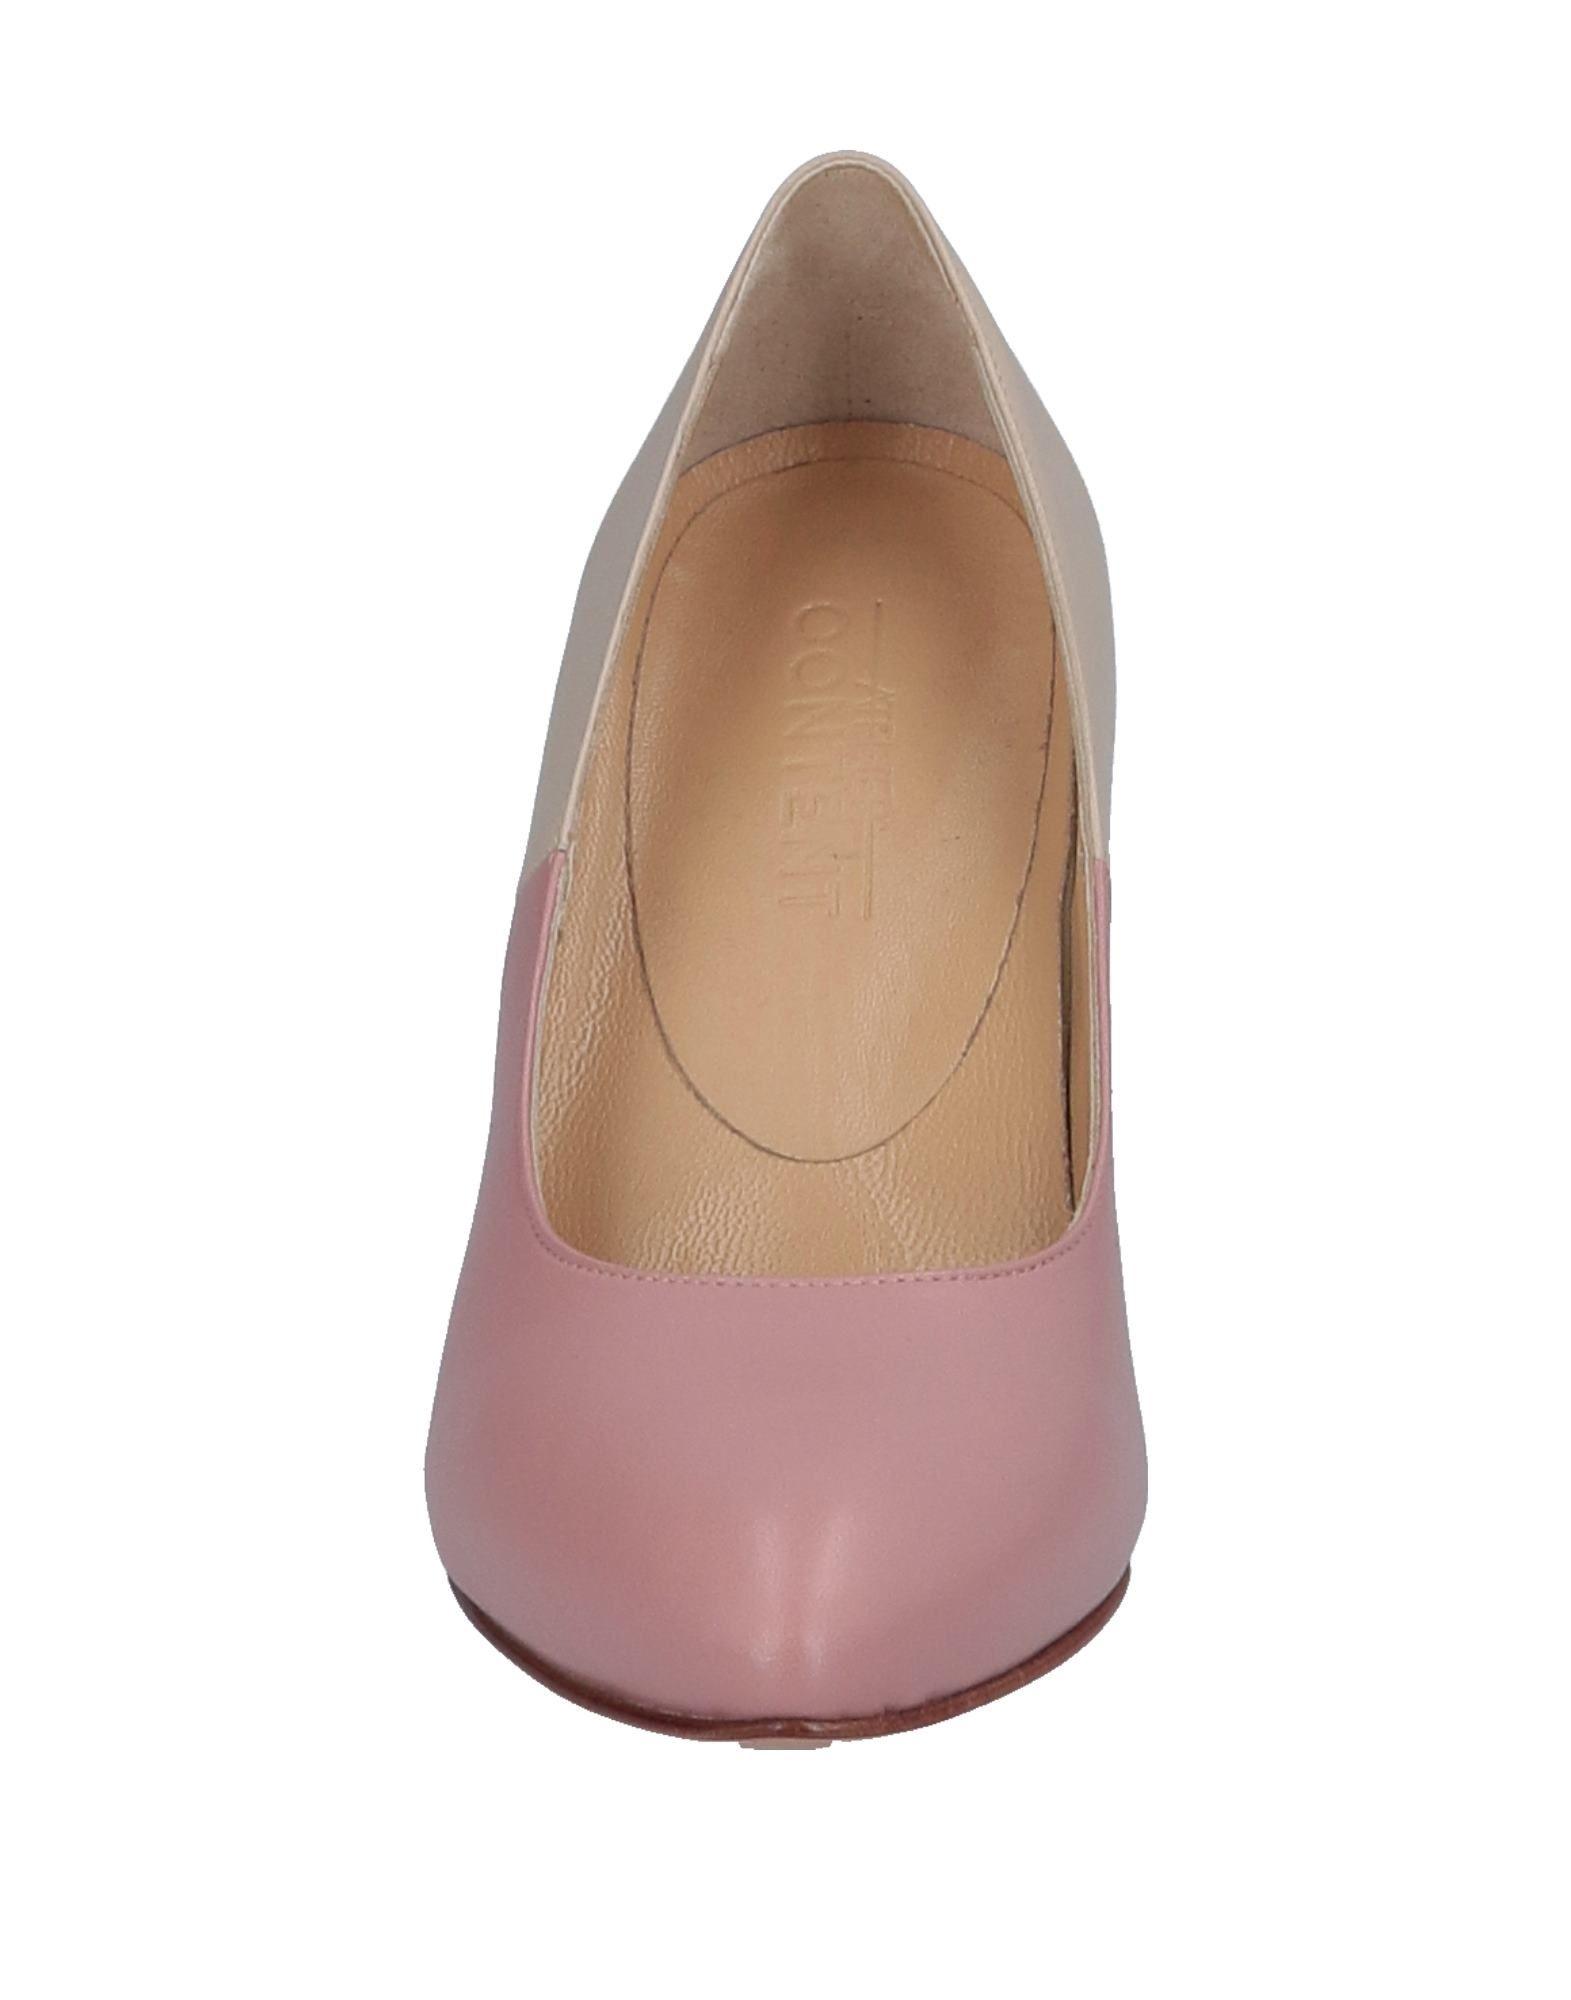 Stilvolle Pumps billige Schuhe Atelier Content Pumps Stilvolle Damen  11522566PS 07362f